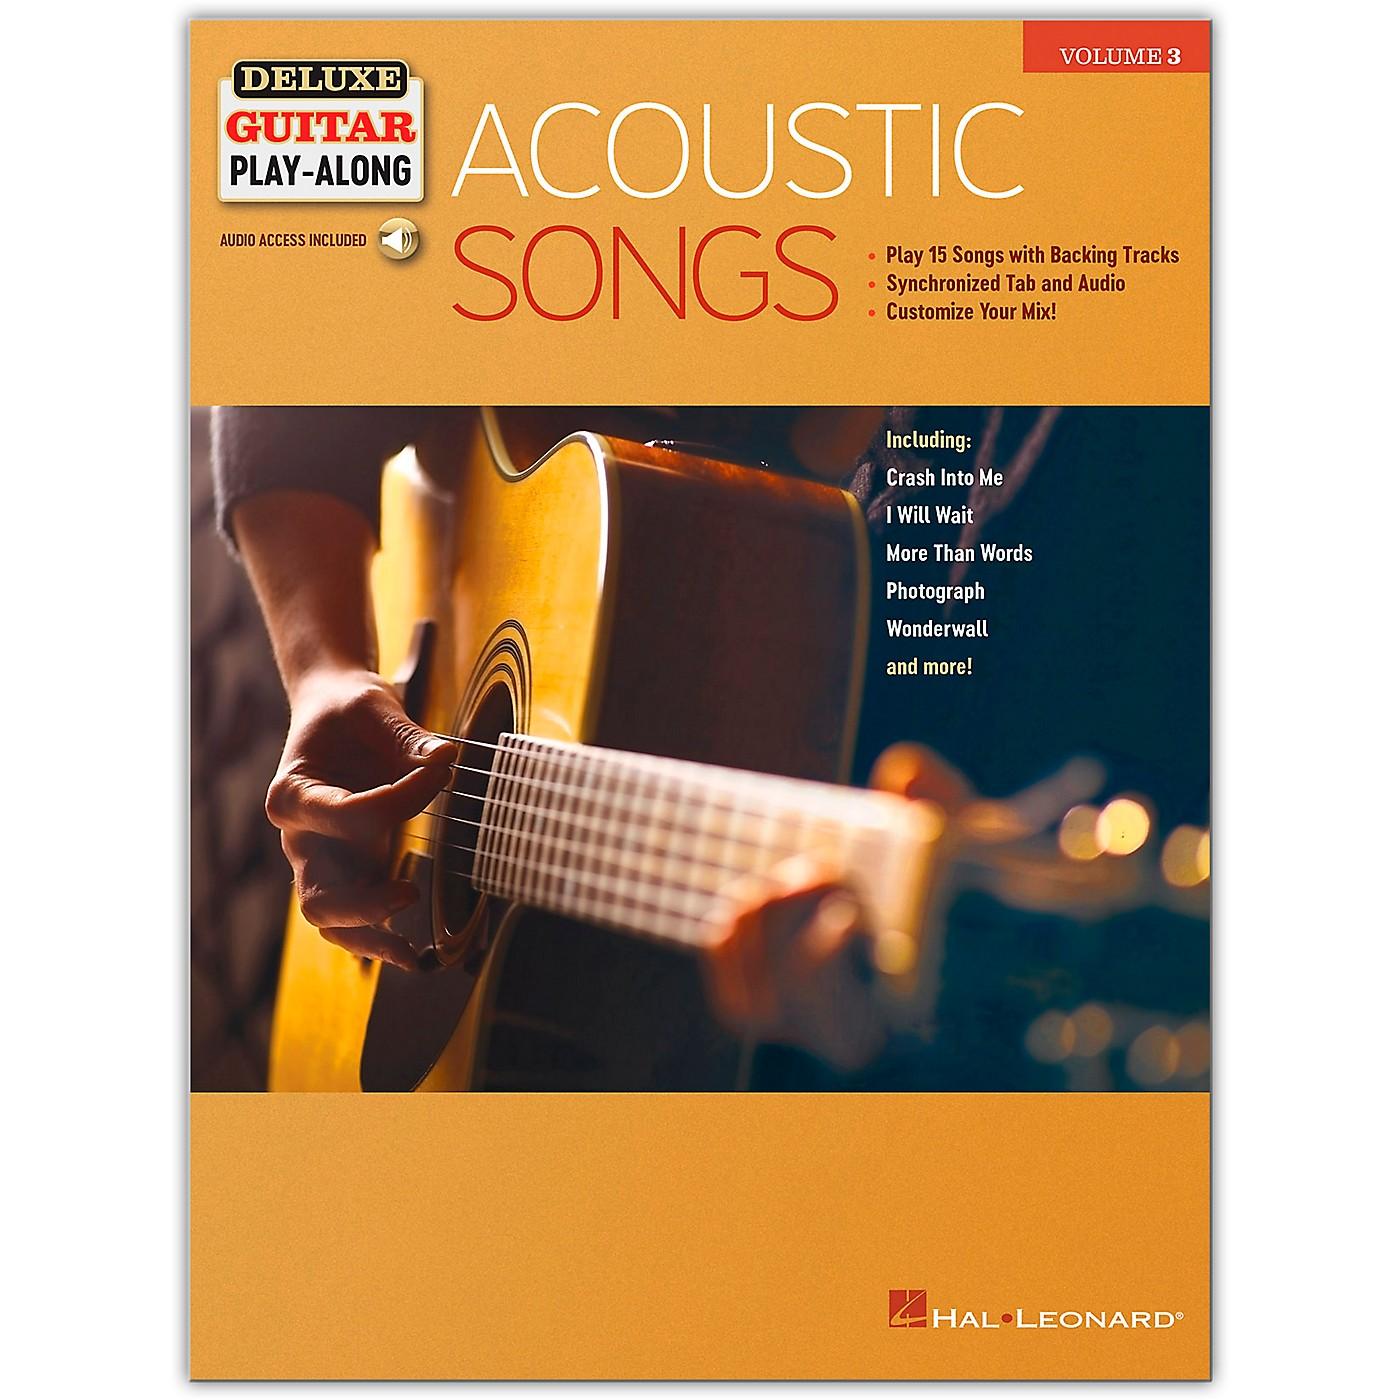 Hal Leonard Acoustic Songs Deluxe Guitar Play-Along Volume 3 Book/Audio Online thumbnail